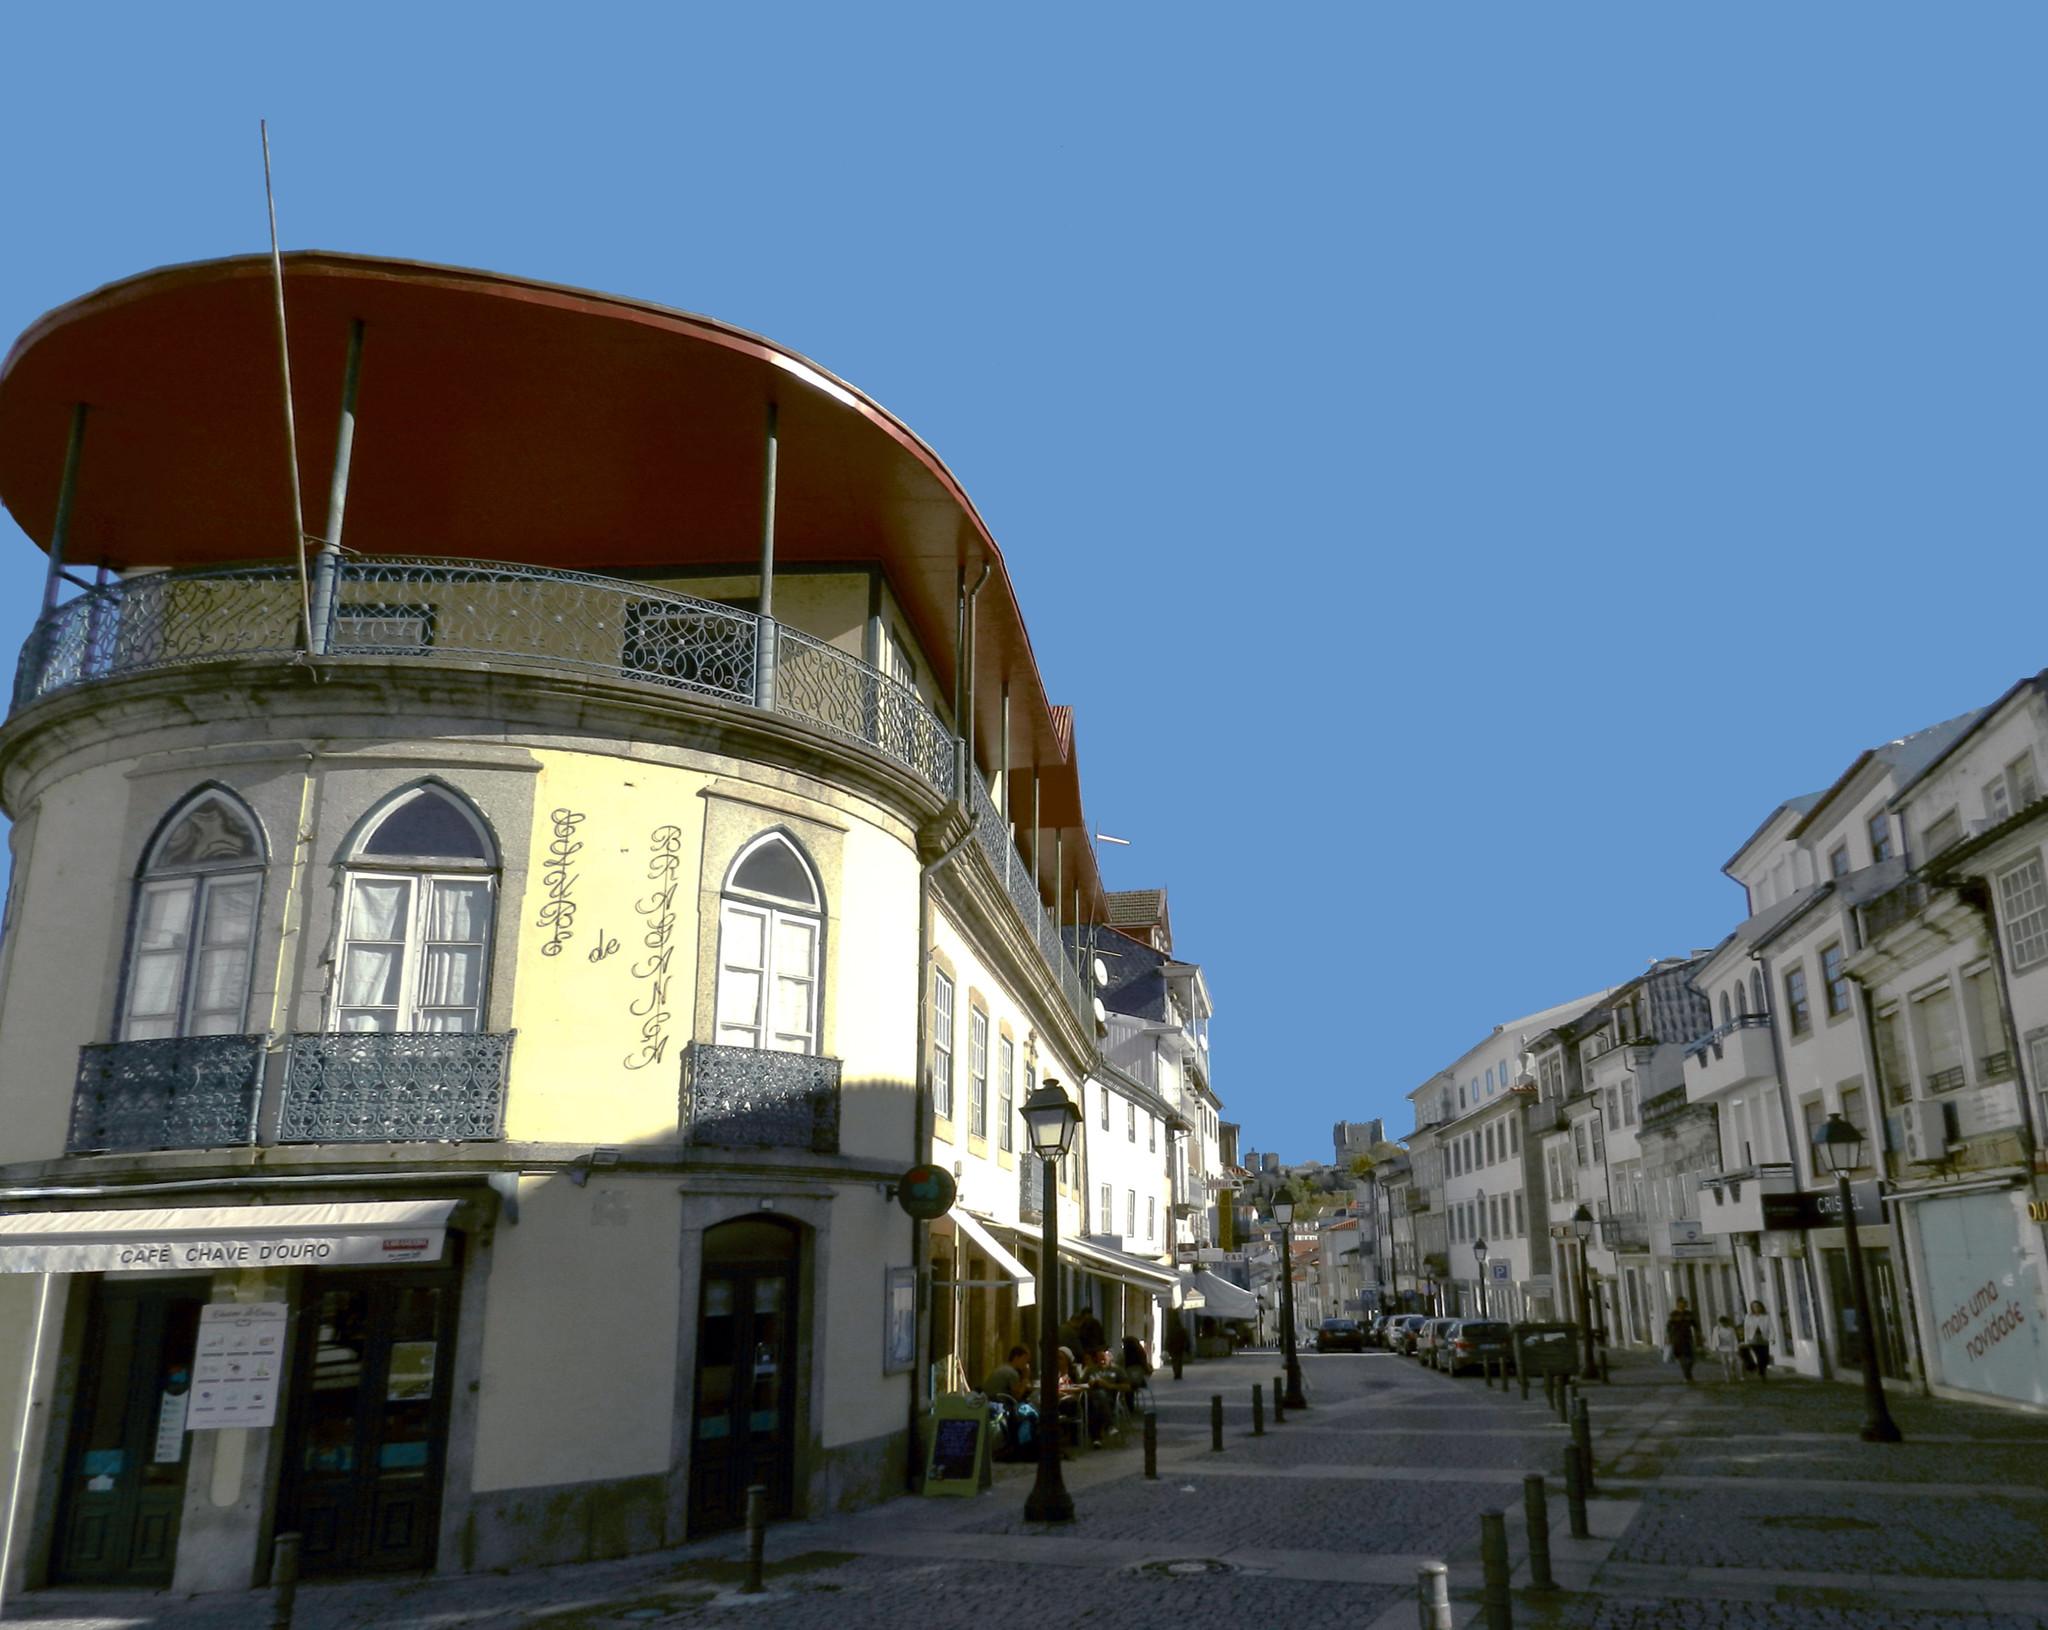 Rua de la Republica Braganza Portugal